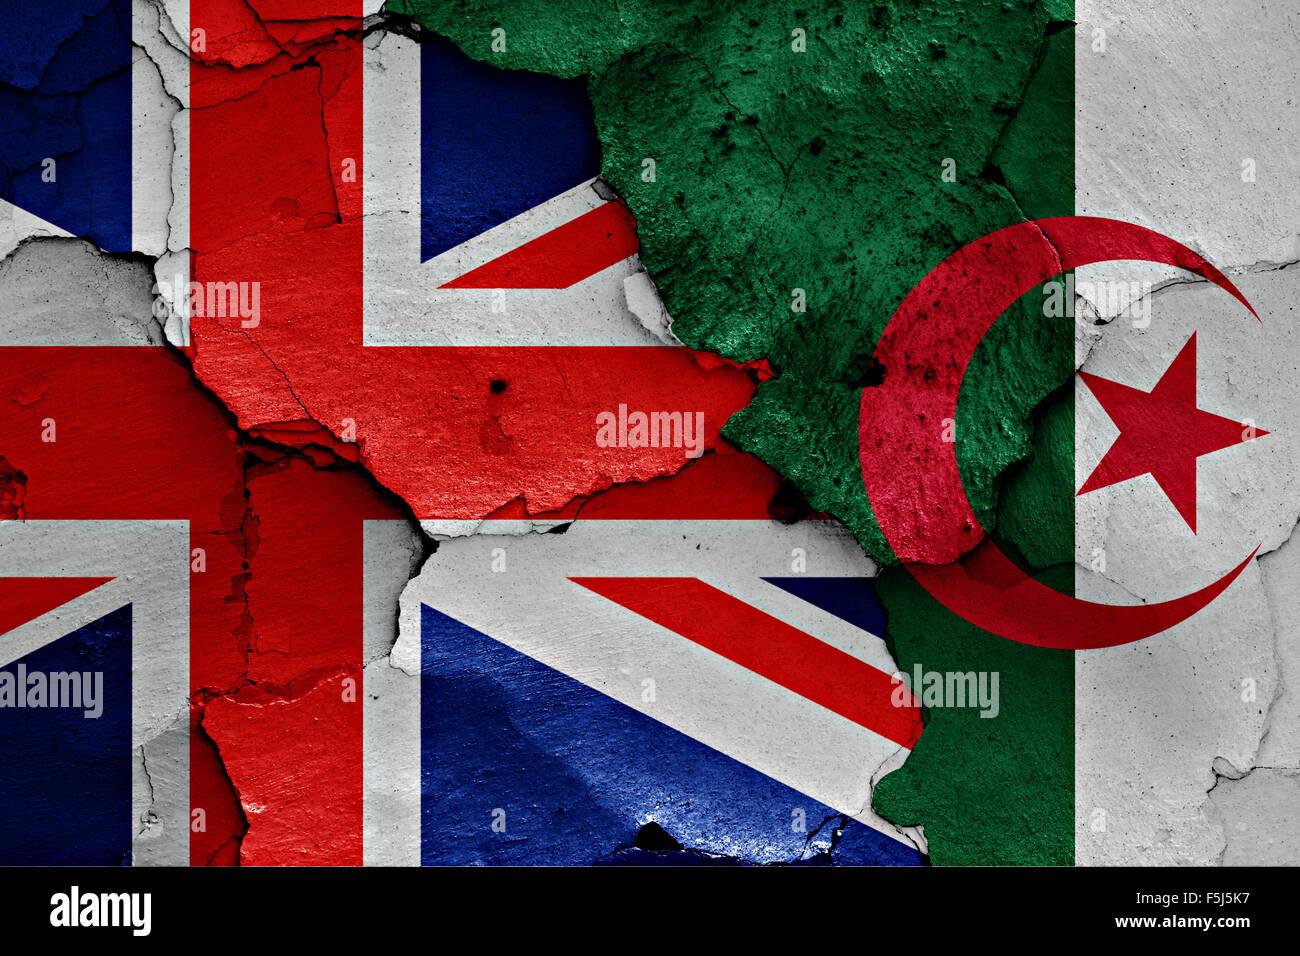 Pabellón de España y Argelia pintados en la pared agrietada Imagen De Stock